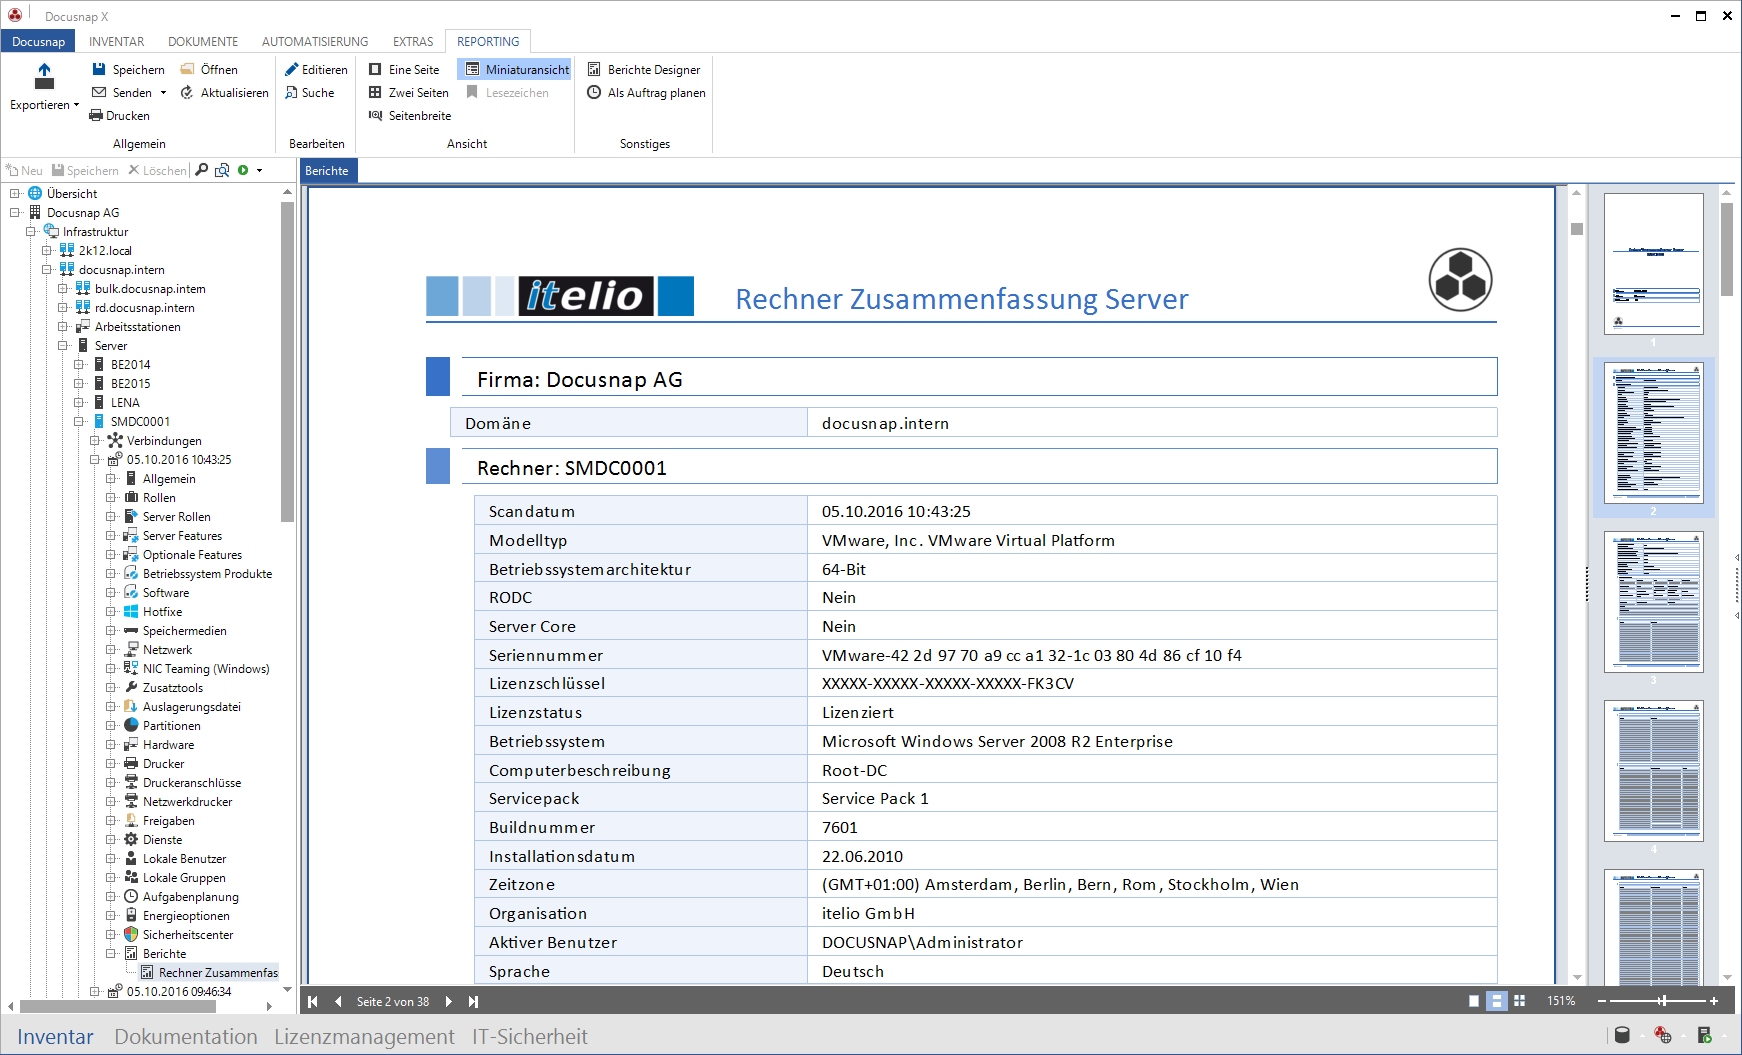 Screenshot: Berichtausgabe der Docusnap IT-Dokumentation